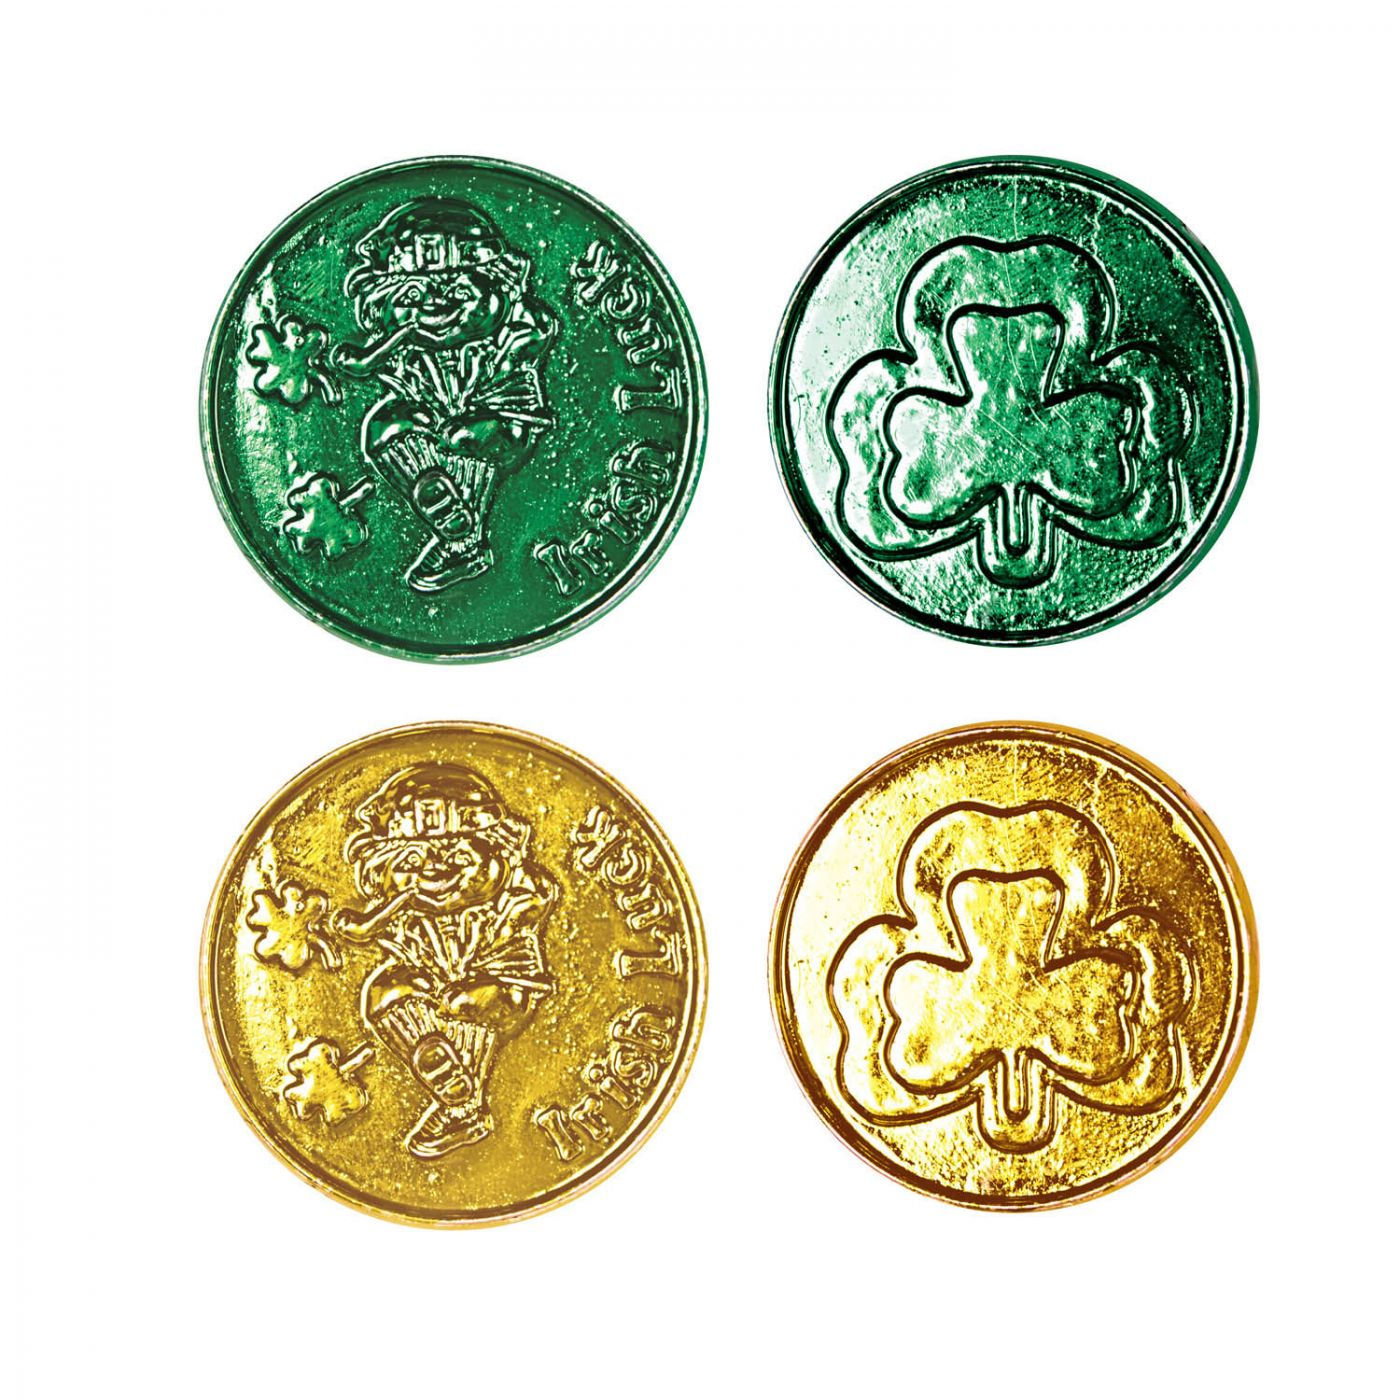 Lucky Leprechaun Plastic Coins image